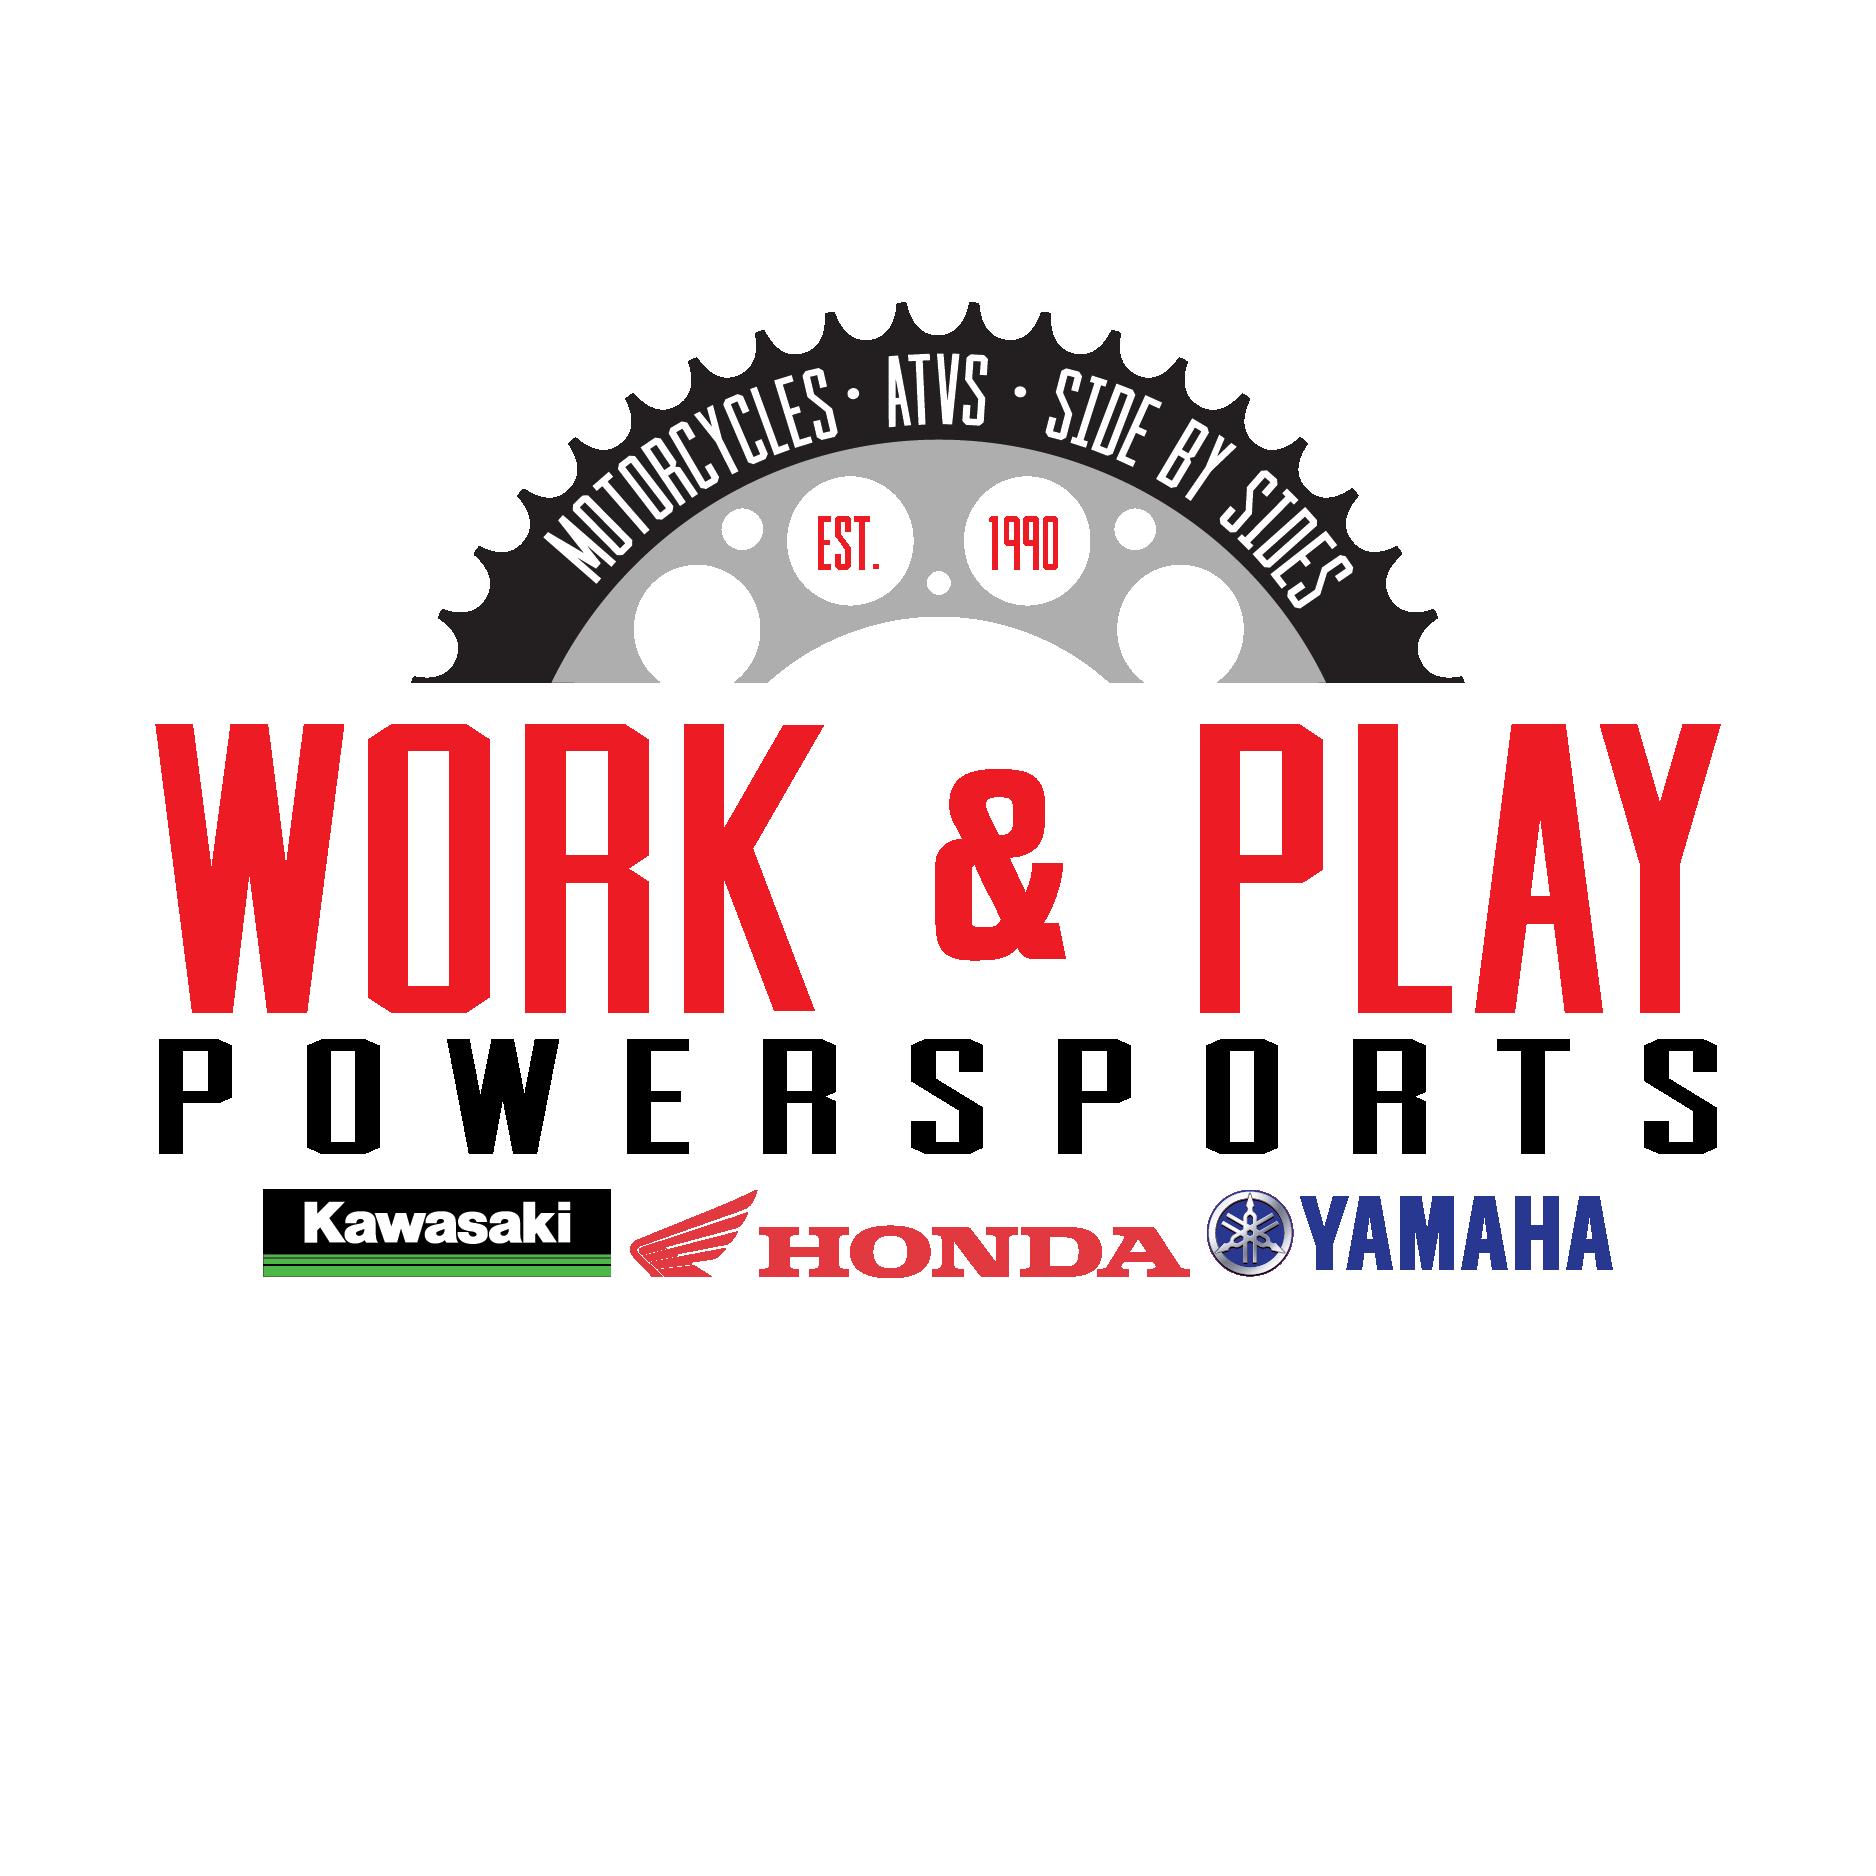 Work & Play Powersports